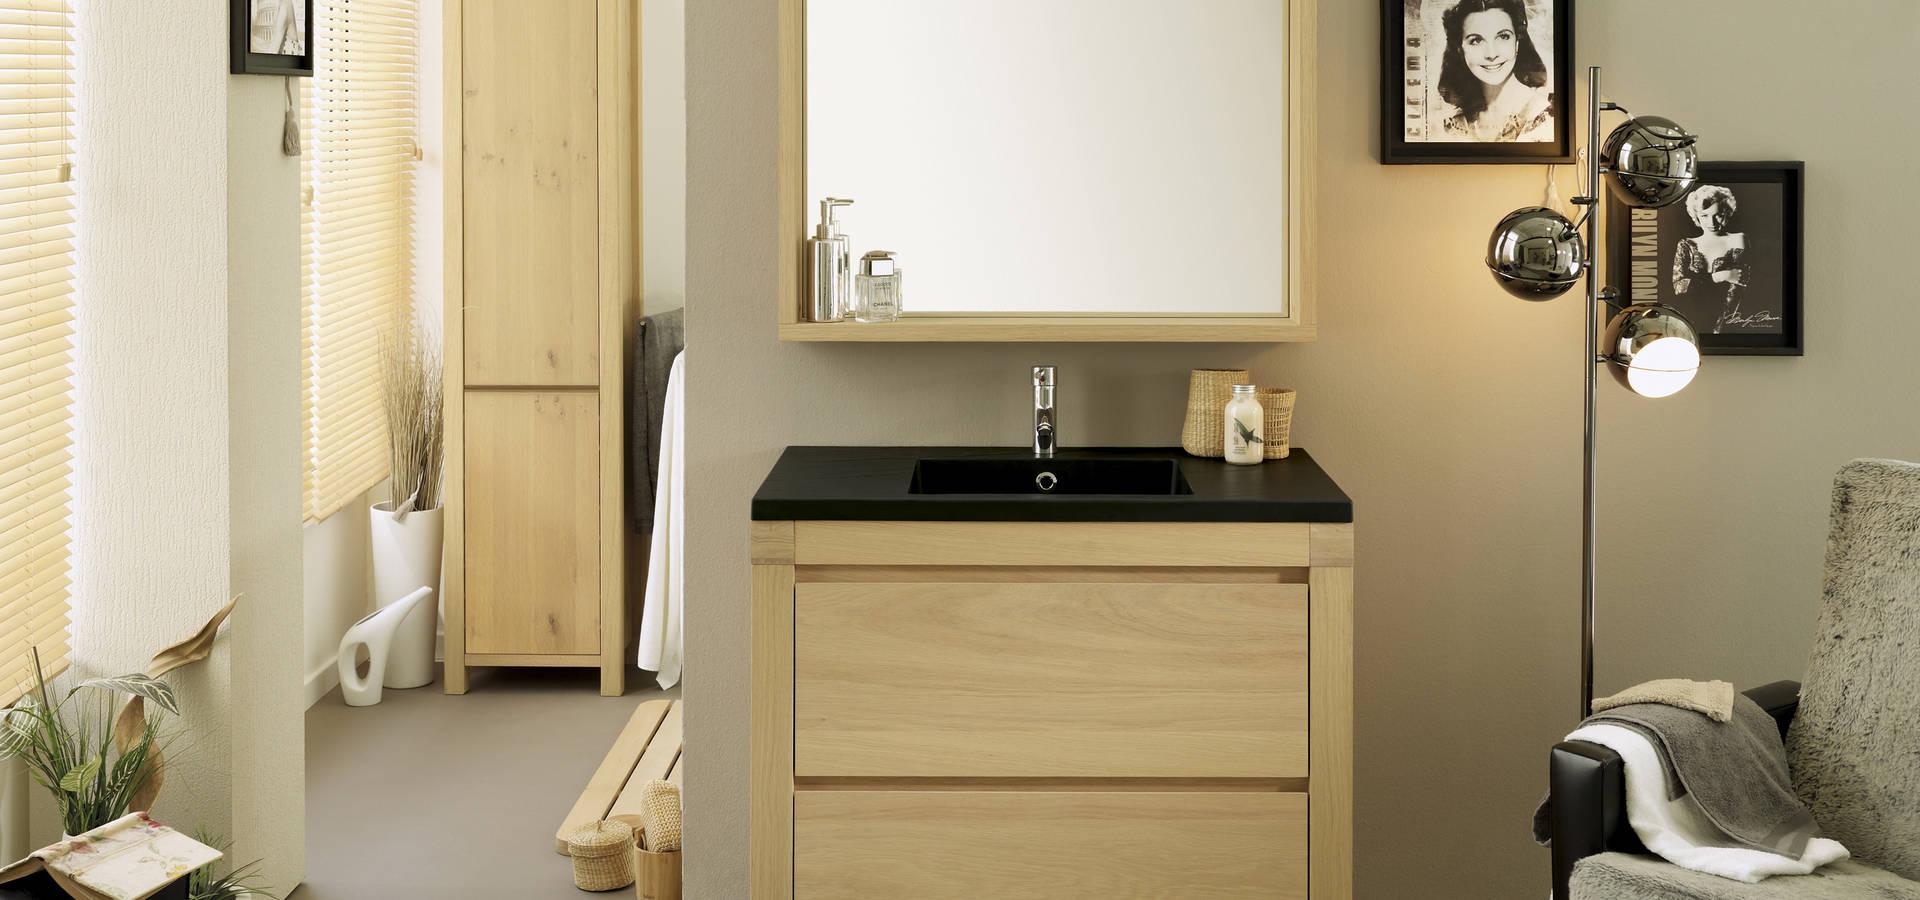 parisot furniture accessories in saint loup sur semouse cedex homify. Black Bedroom Furniture Sets. Home Design Ideas